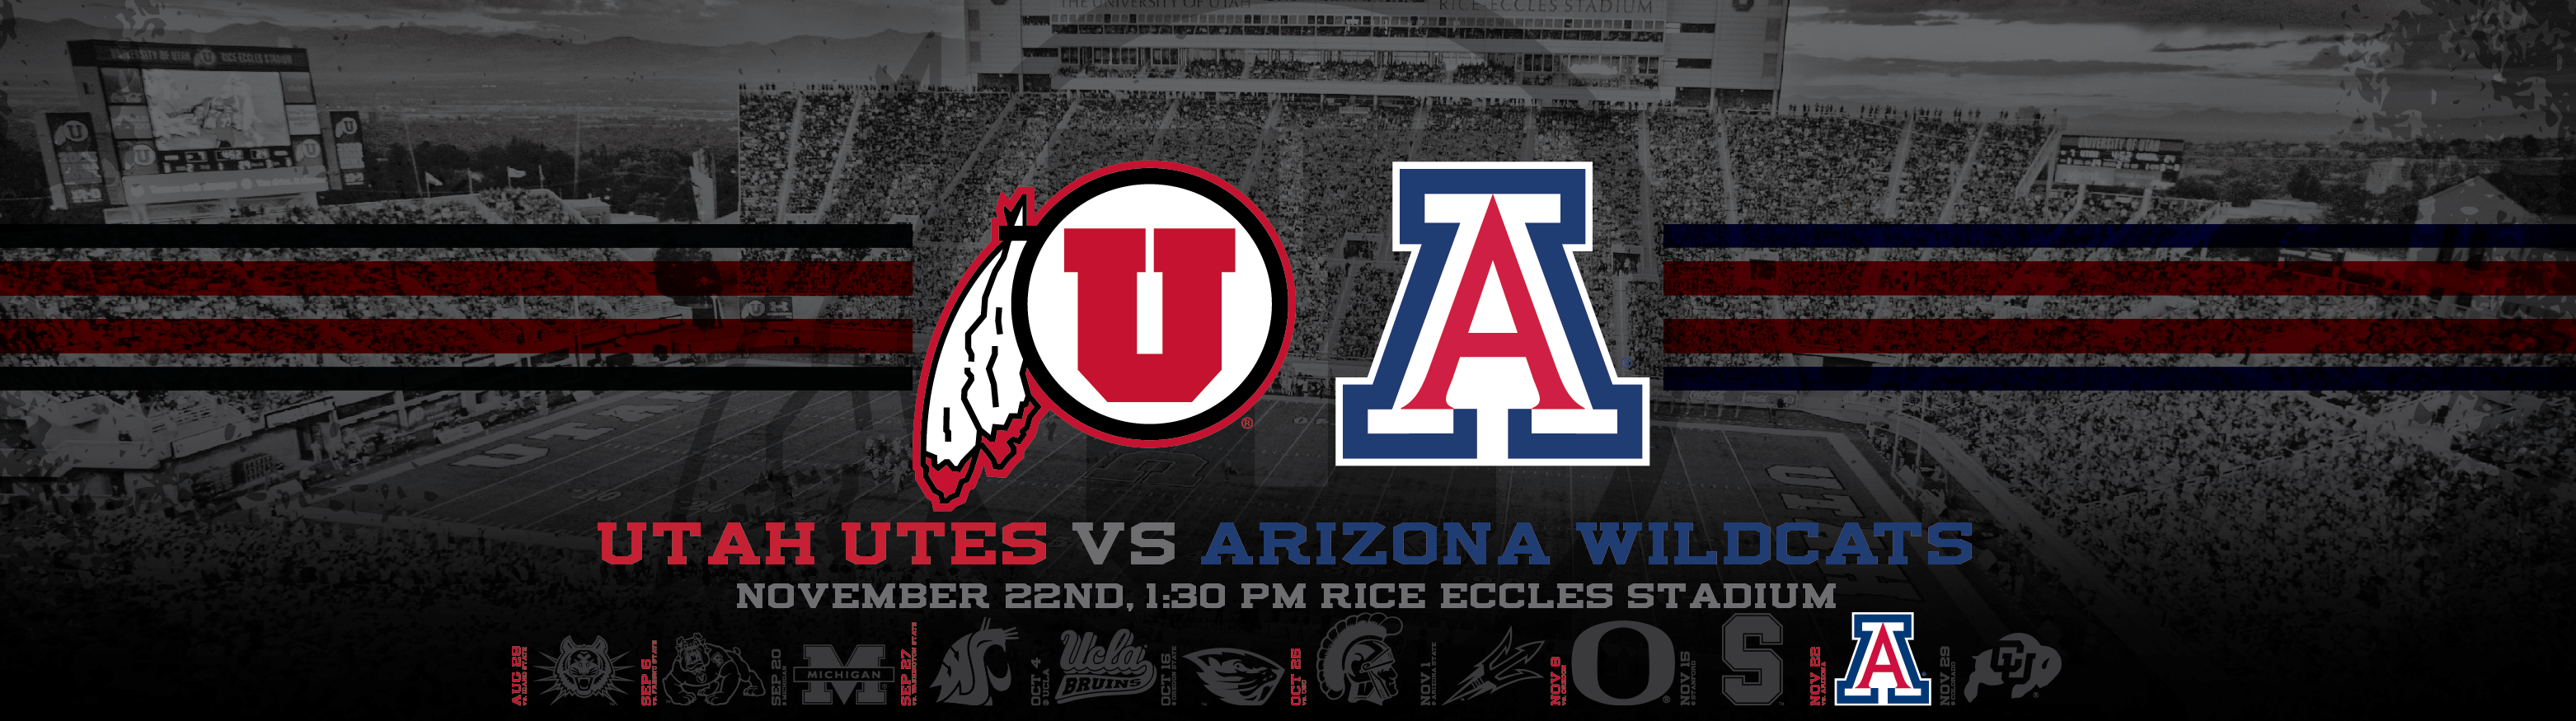 Utah Utes vs Arizona Wildcats Wallpapers Dahlelama 3125x875